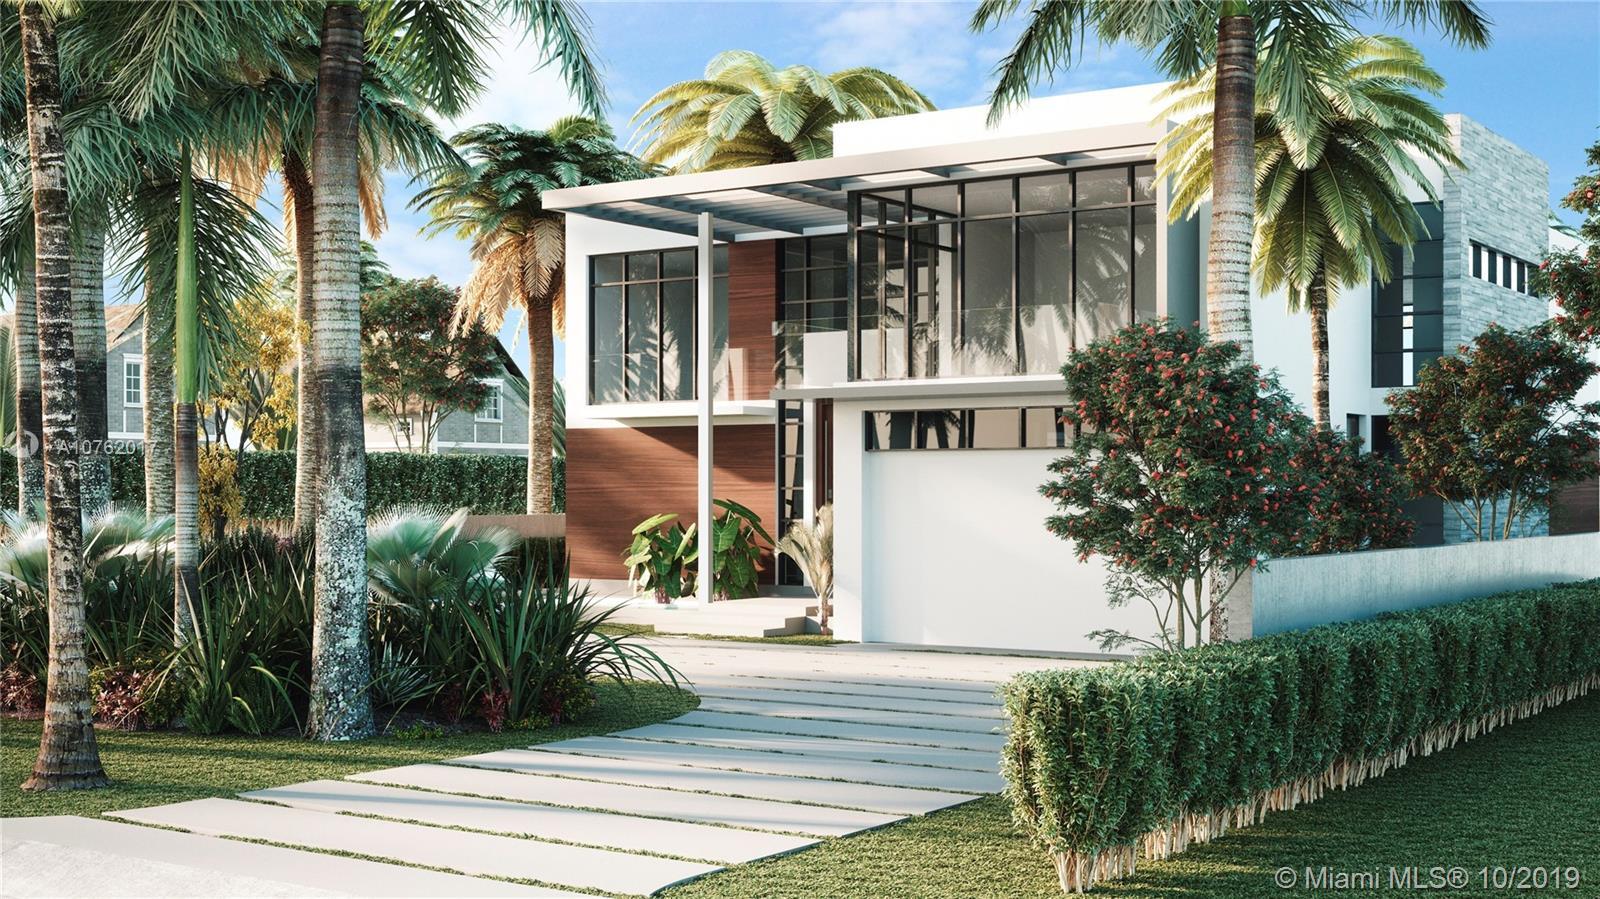 399  Golden Beach Dr  For Sale A10762017, FL